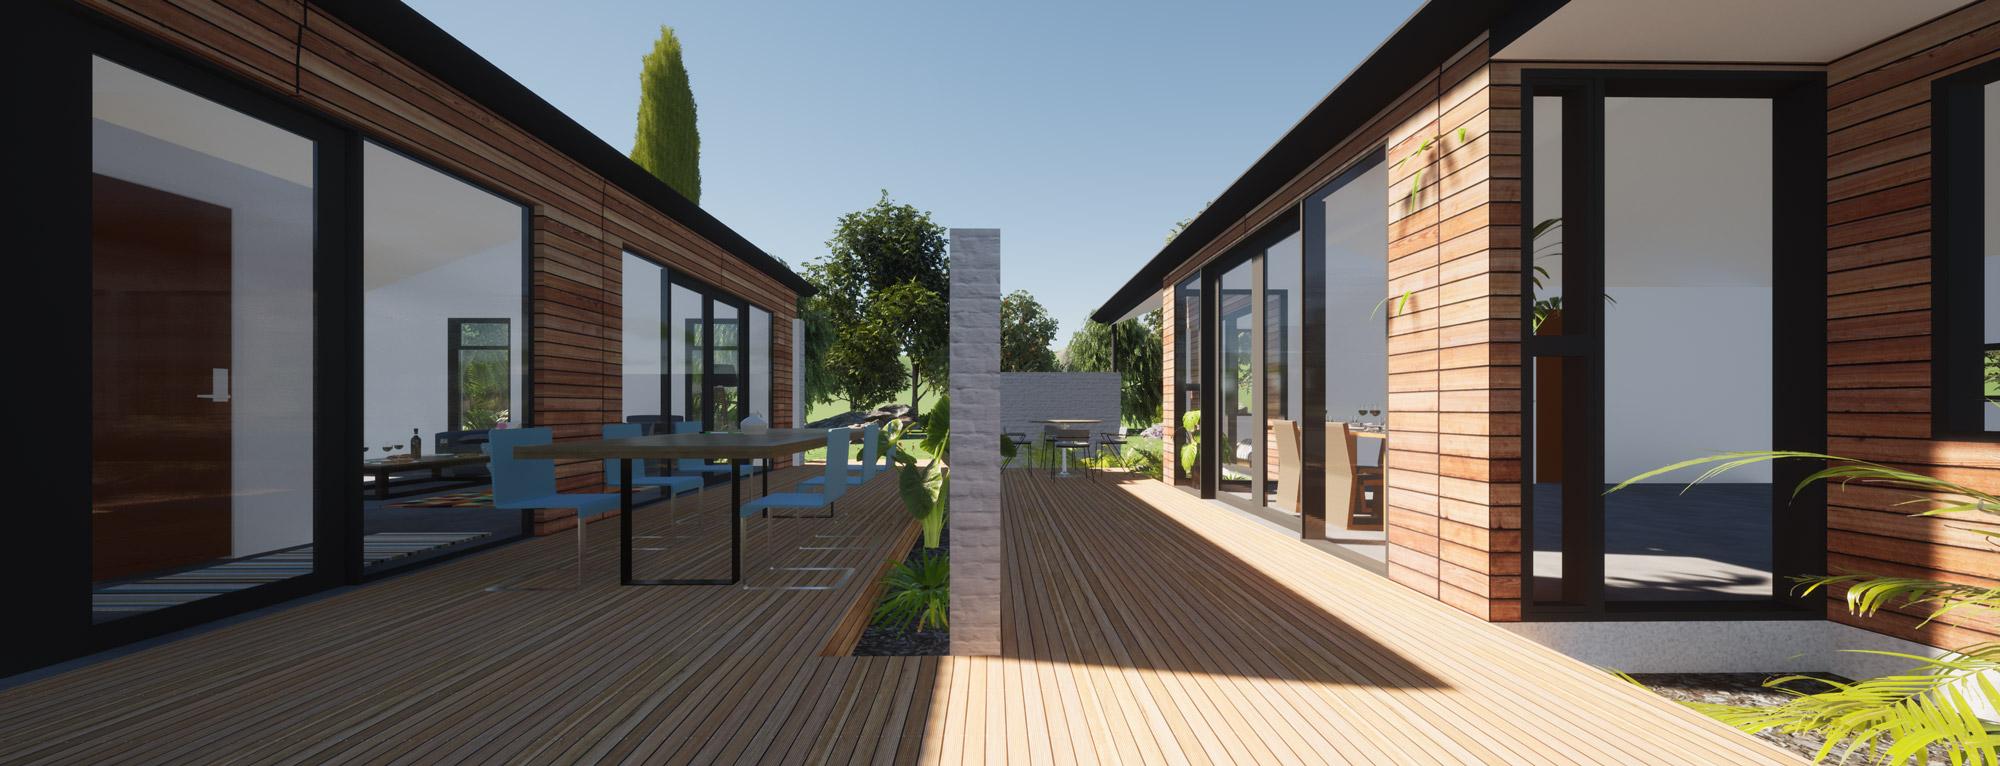 Highland Park, Dunedin view 4 by Architecture Design Studio